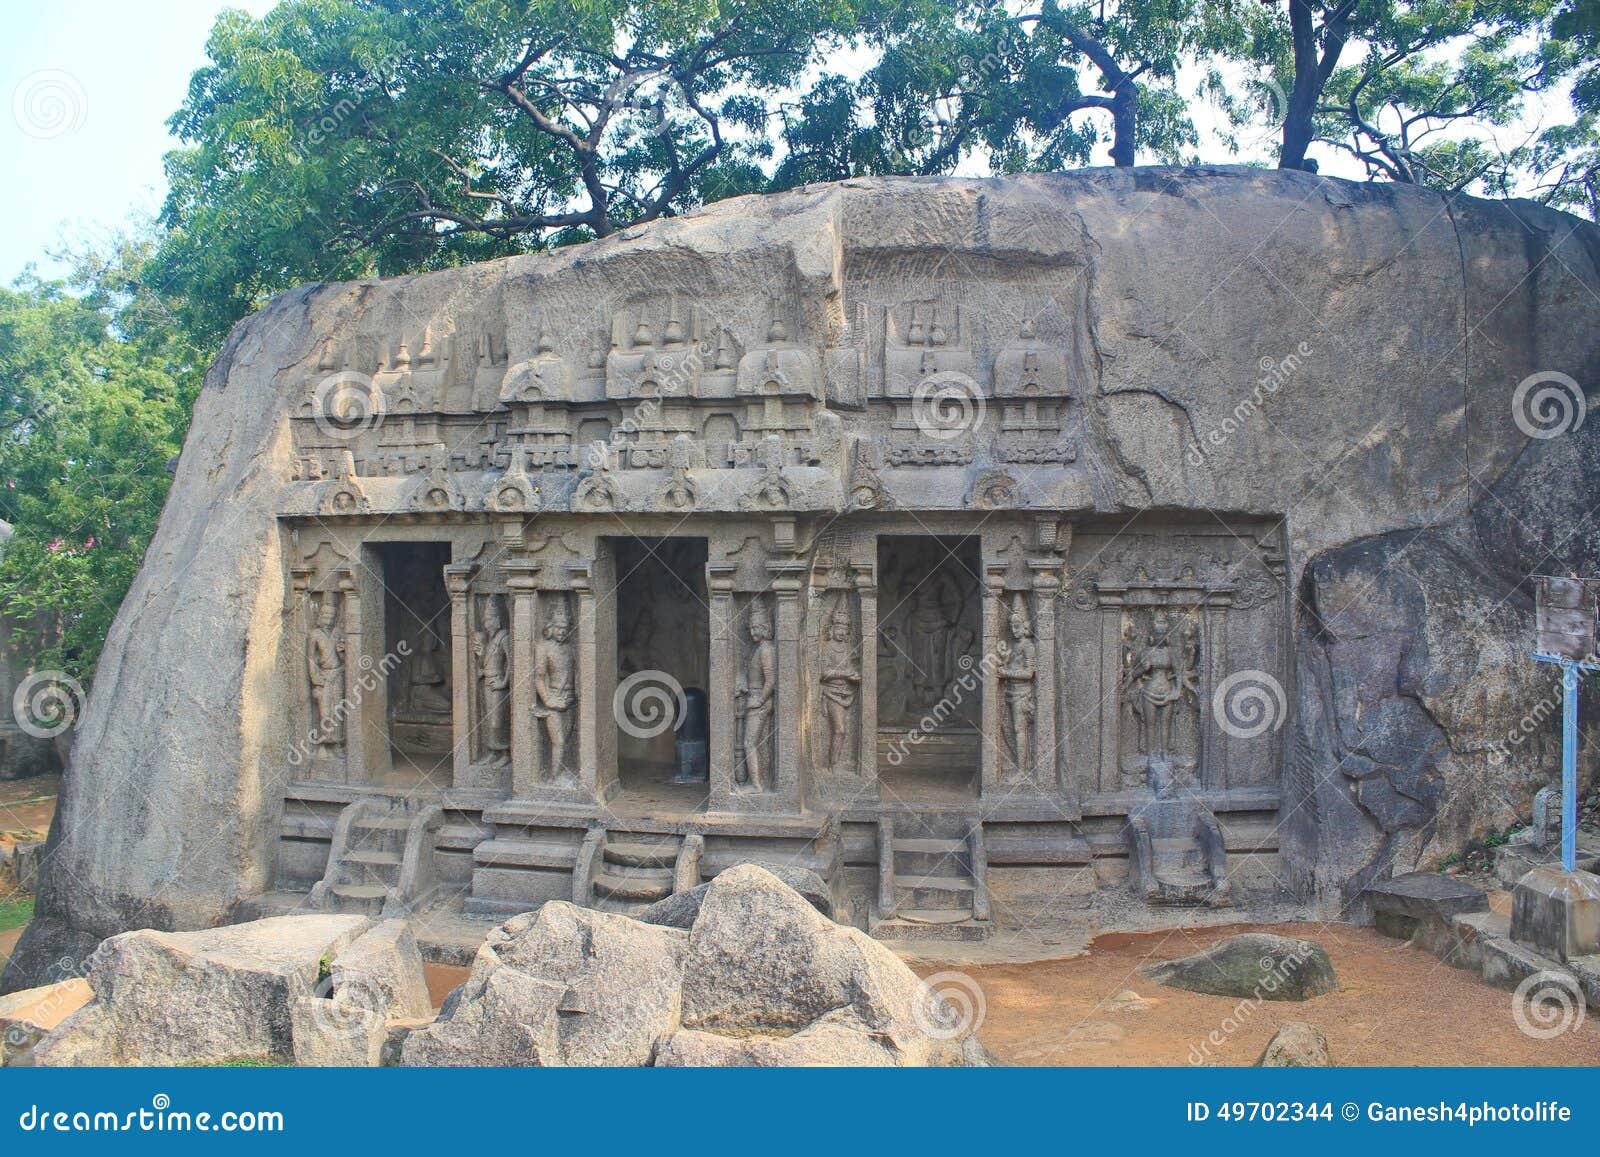 Monolitiskt vagga snitttemplet, Mahabalipuram